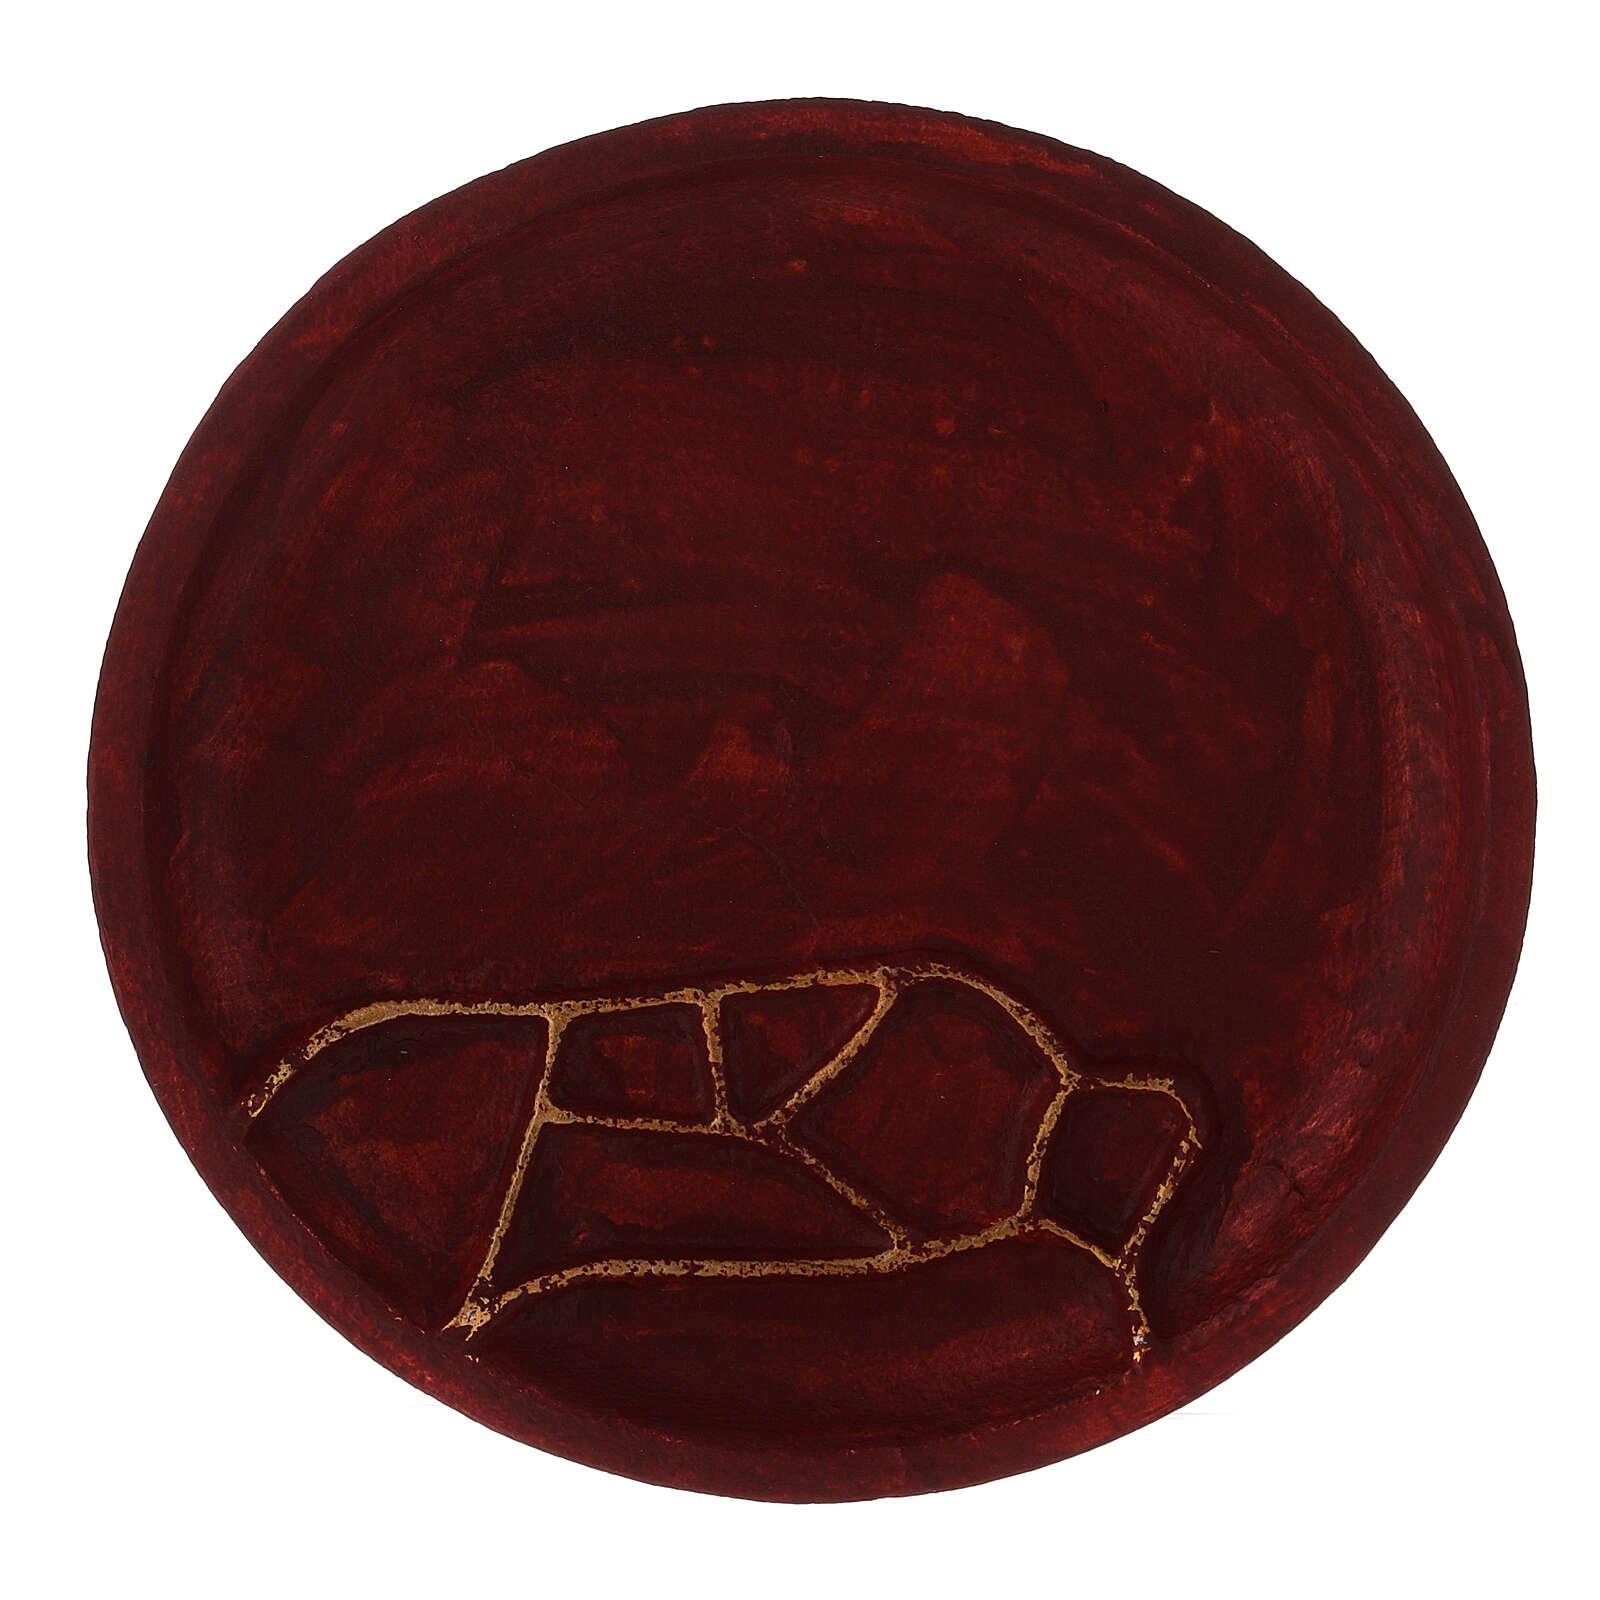 Plato para vela aluminio rojo motivo abstracto d. 14 cm 3